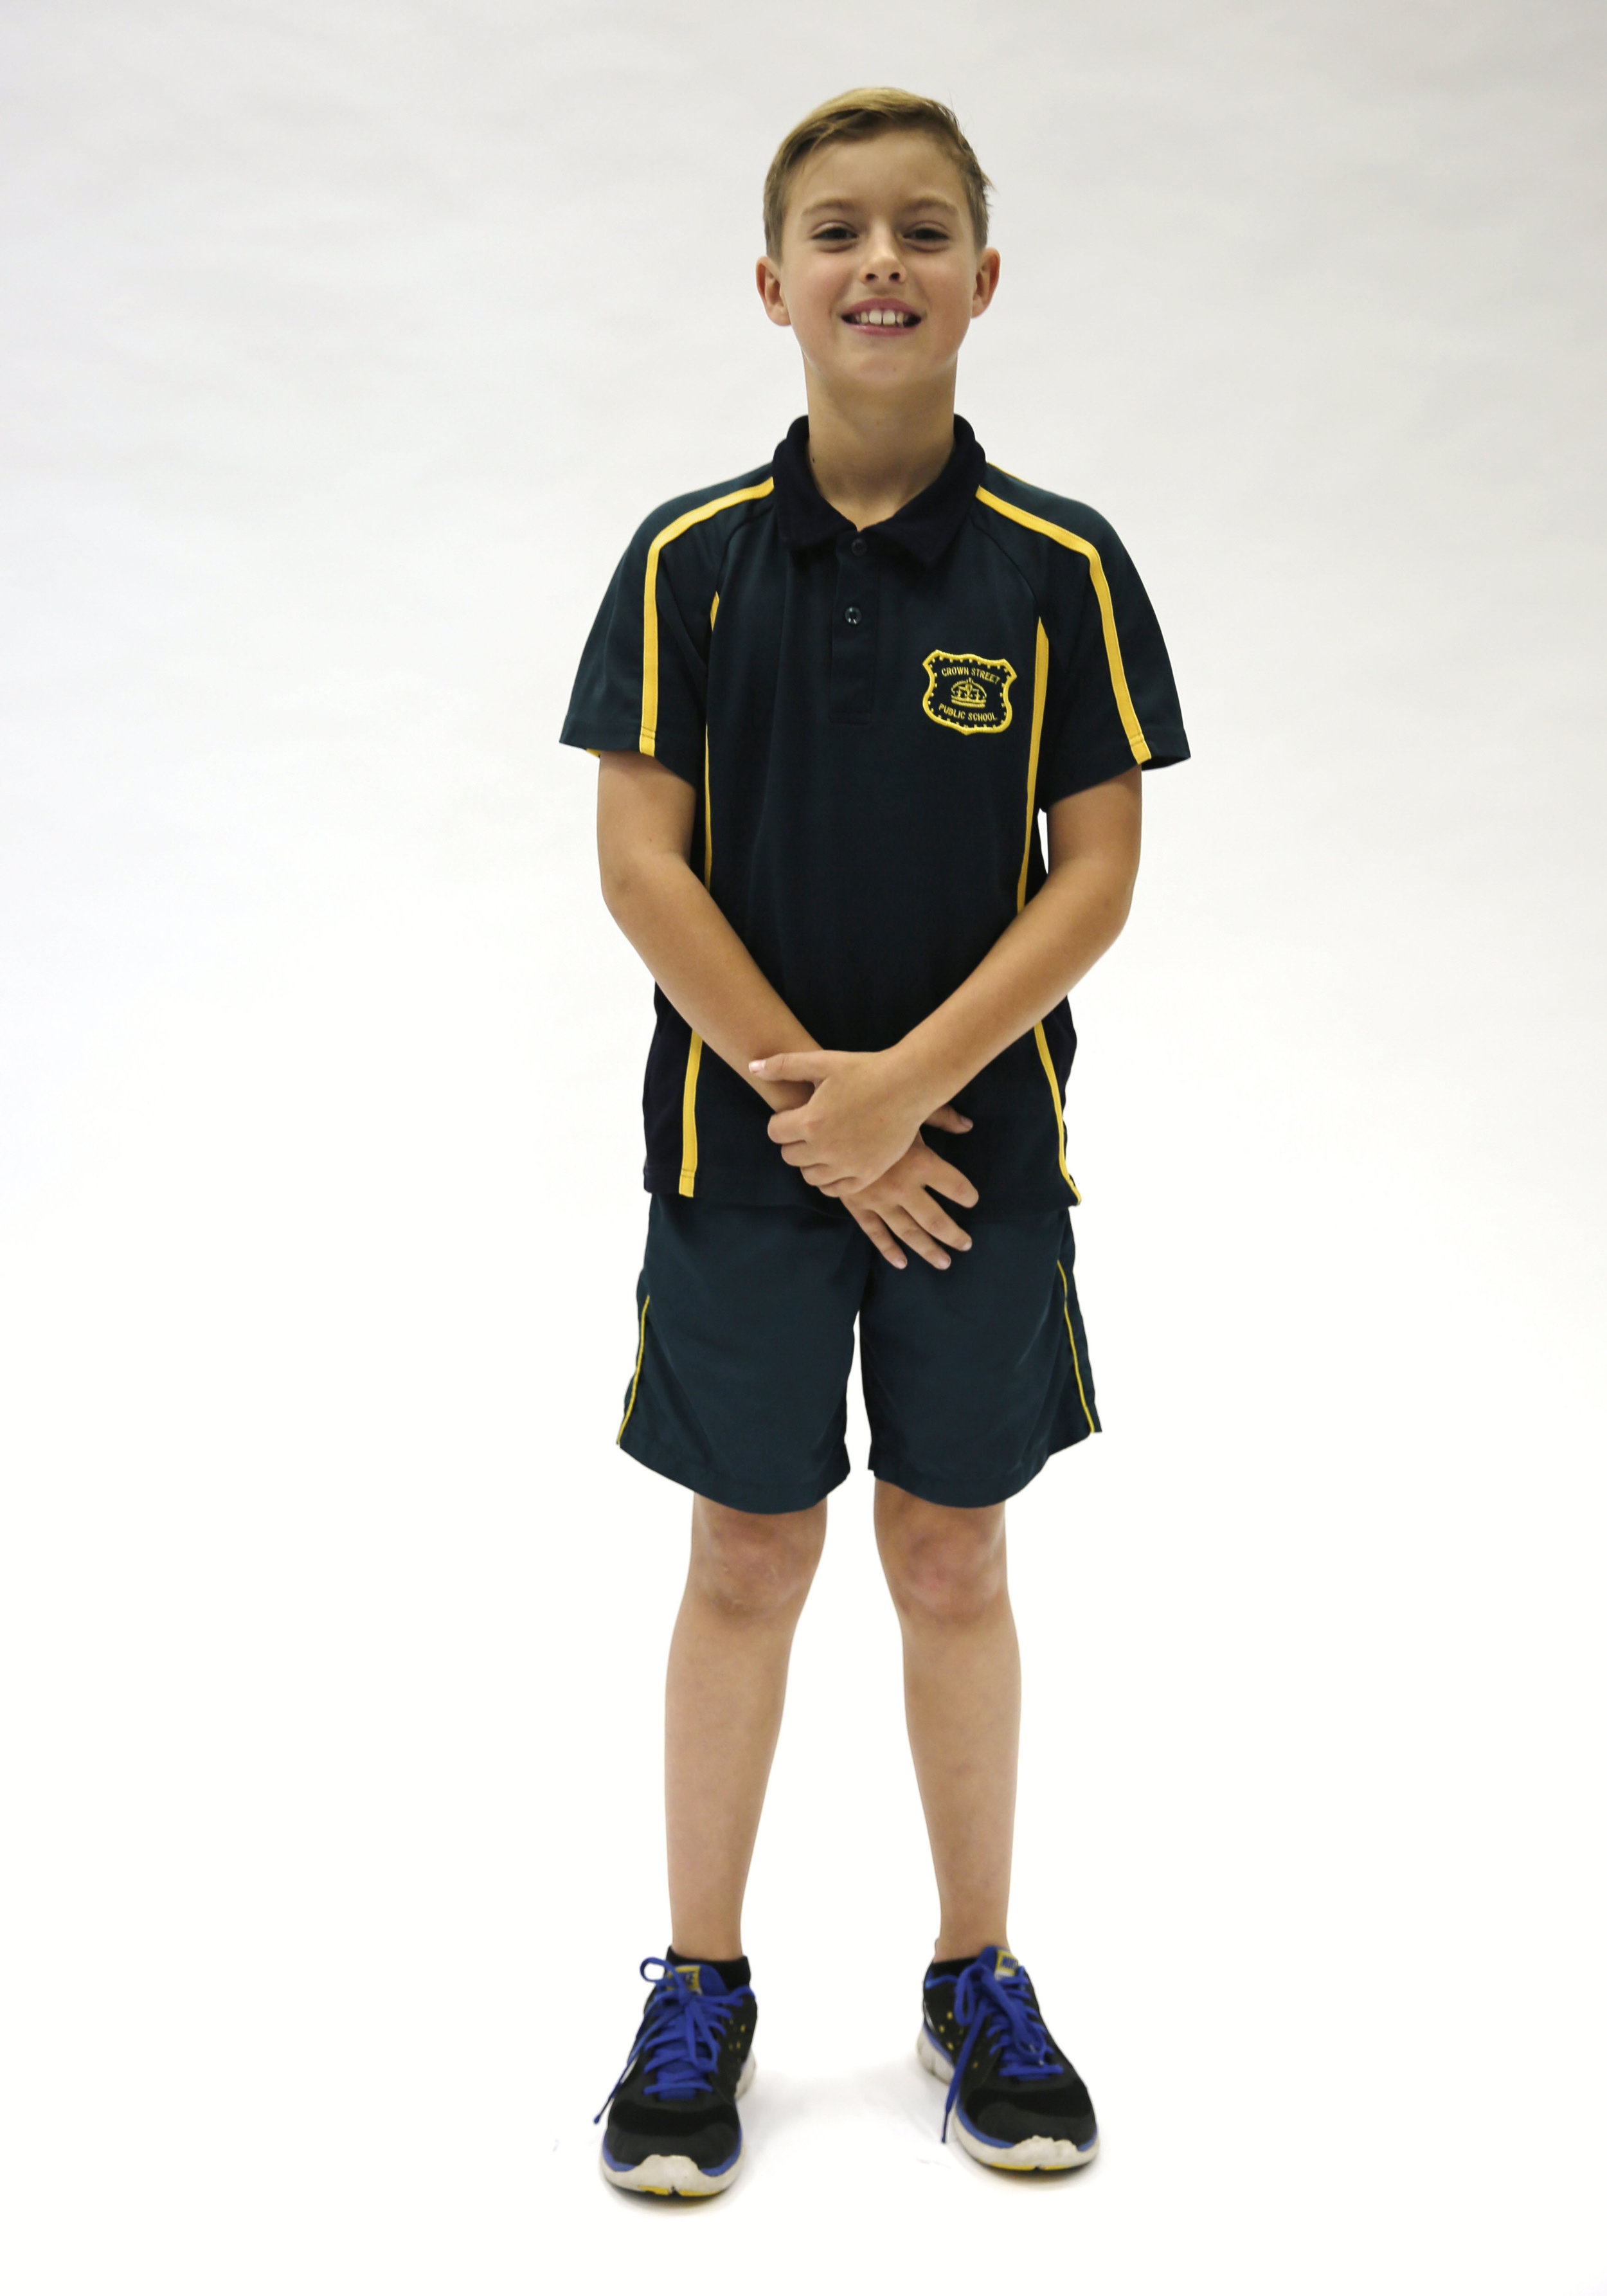 Sports polo, sports shorts - unisex